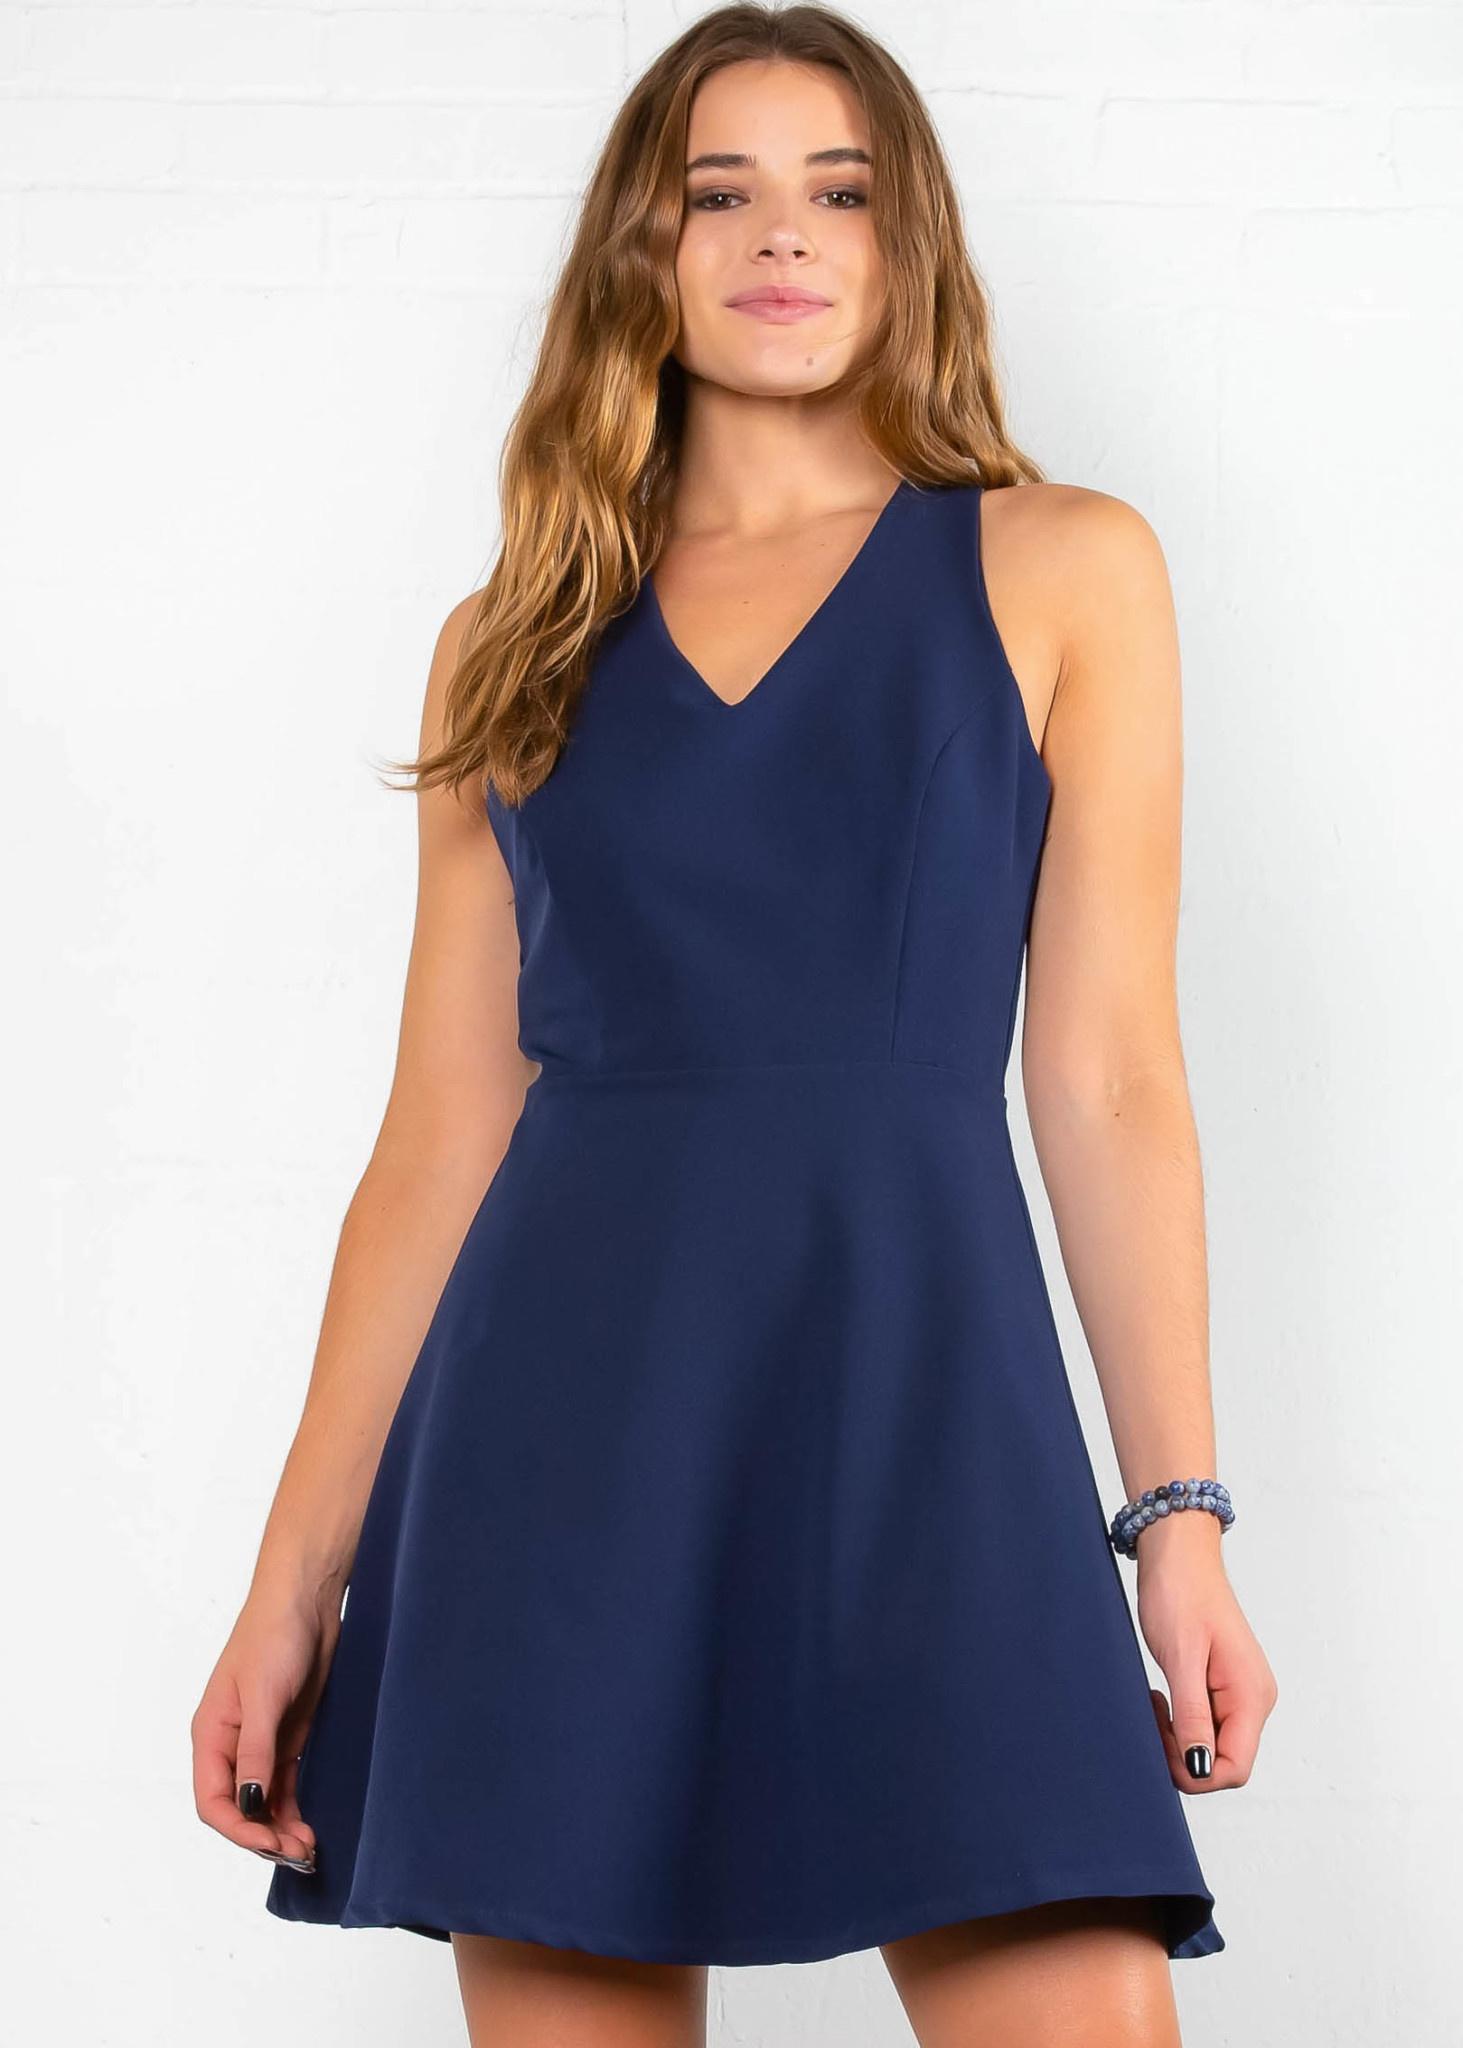 WALK THIS WAY DRESS